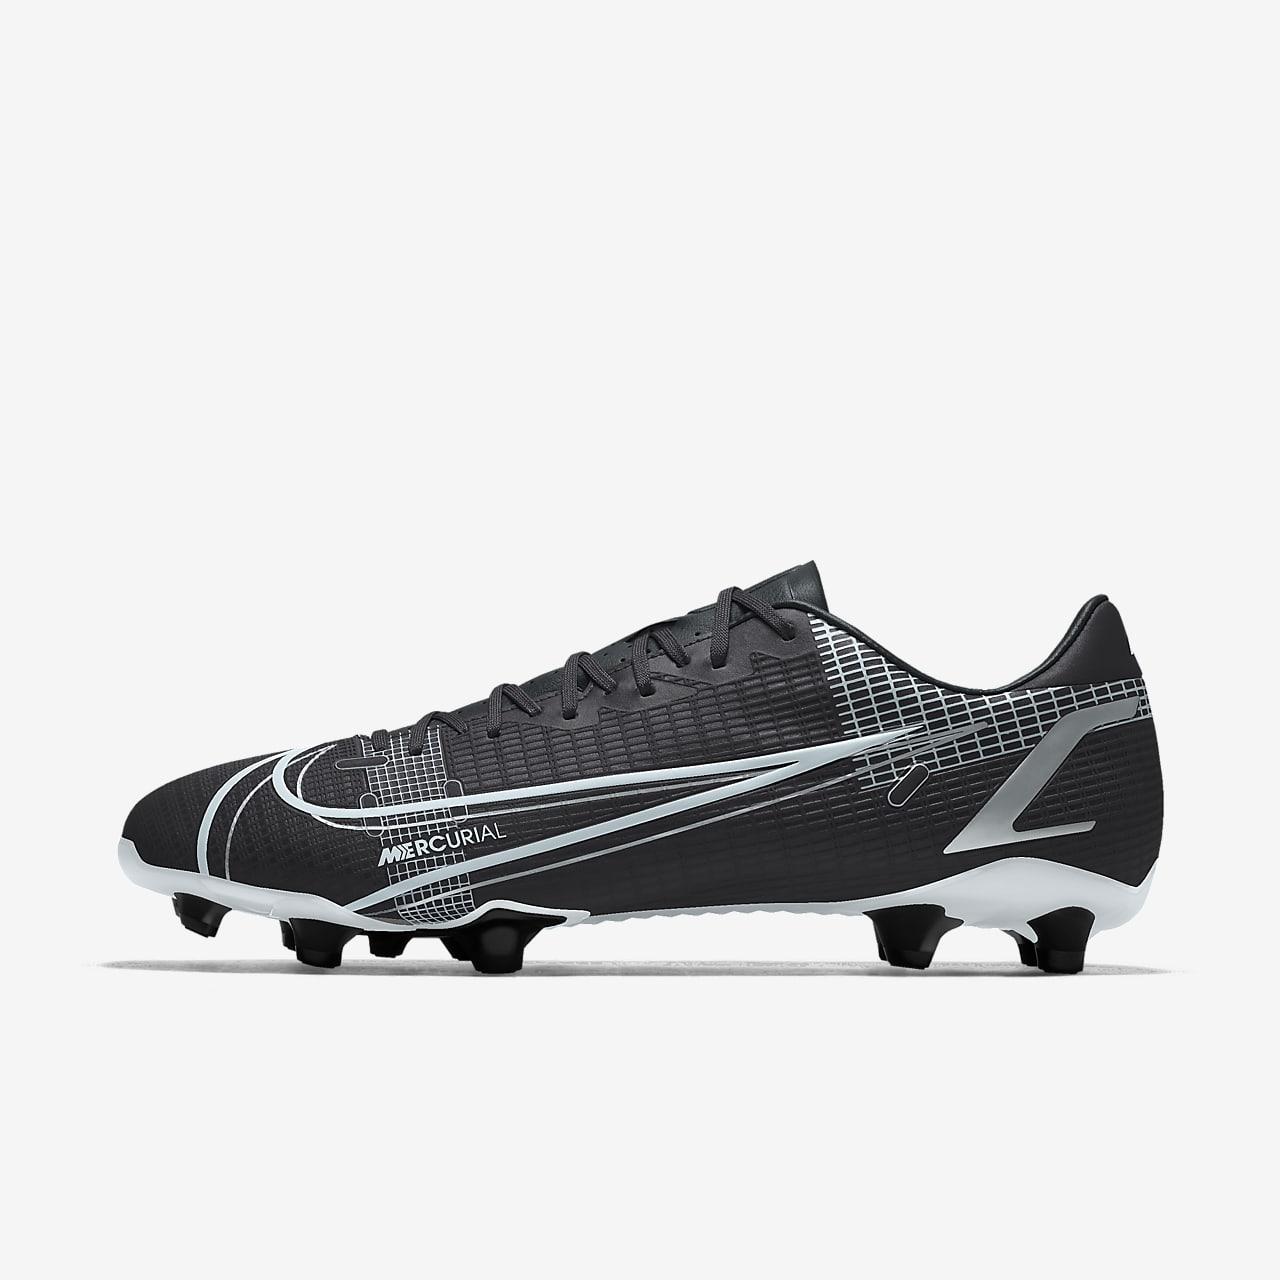 Nike Mercurial Vapor 14 Academy By You personalisierbarer Fußballschuh